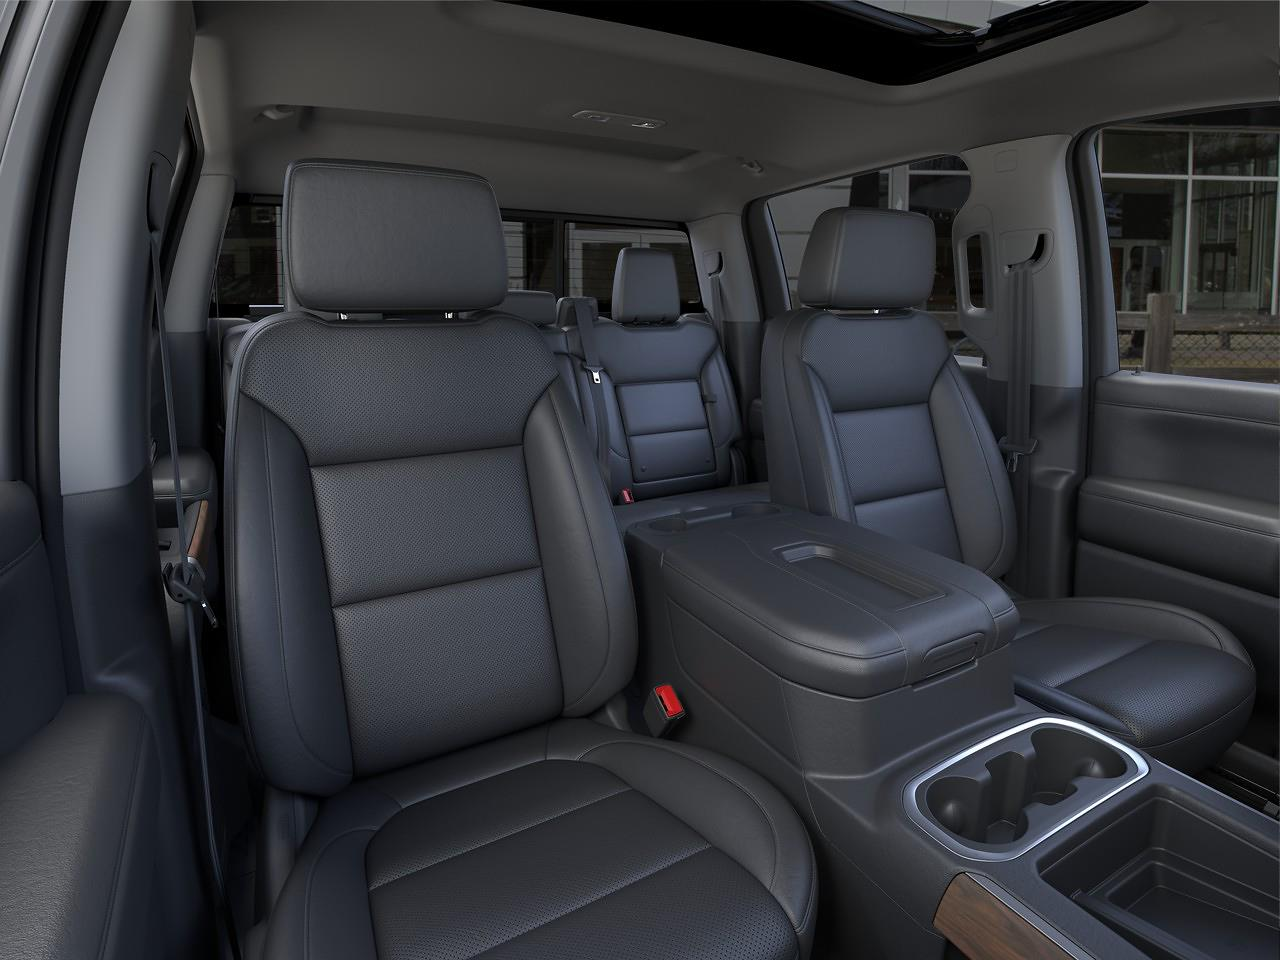 2021 GMC Sierra 1500 Crew Cab 4x4, Pickup #SR1310 - photo 13